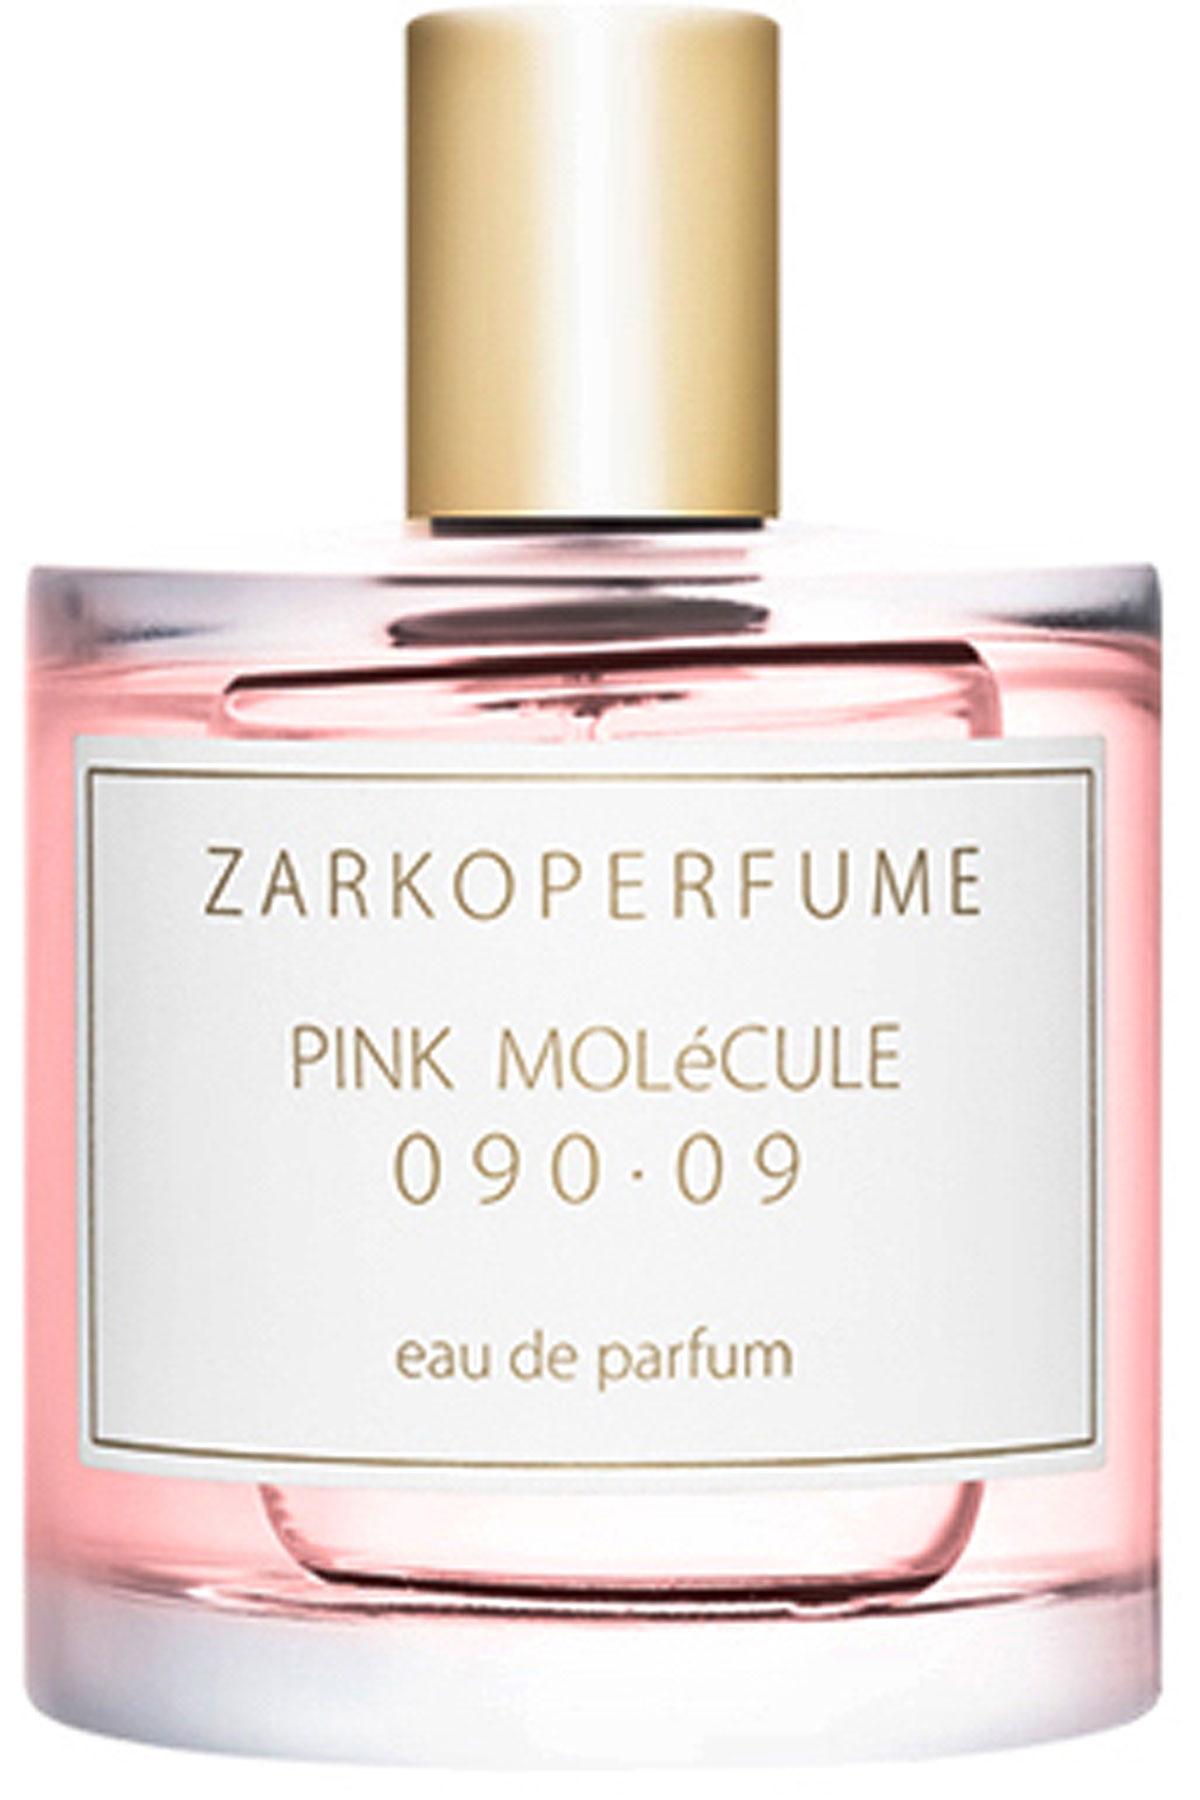 Zarkoperfume Fragrances for Women, Pink Molecule 090.09 - Eau De Parfum - 100 Ml, 2019, 100 ml